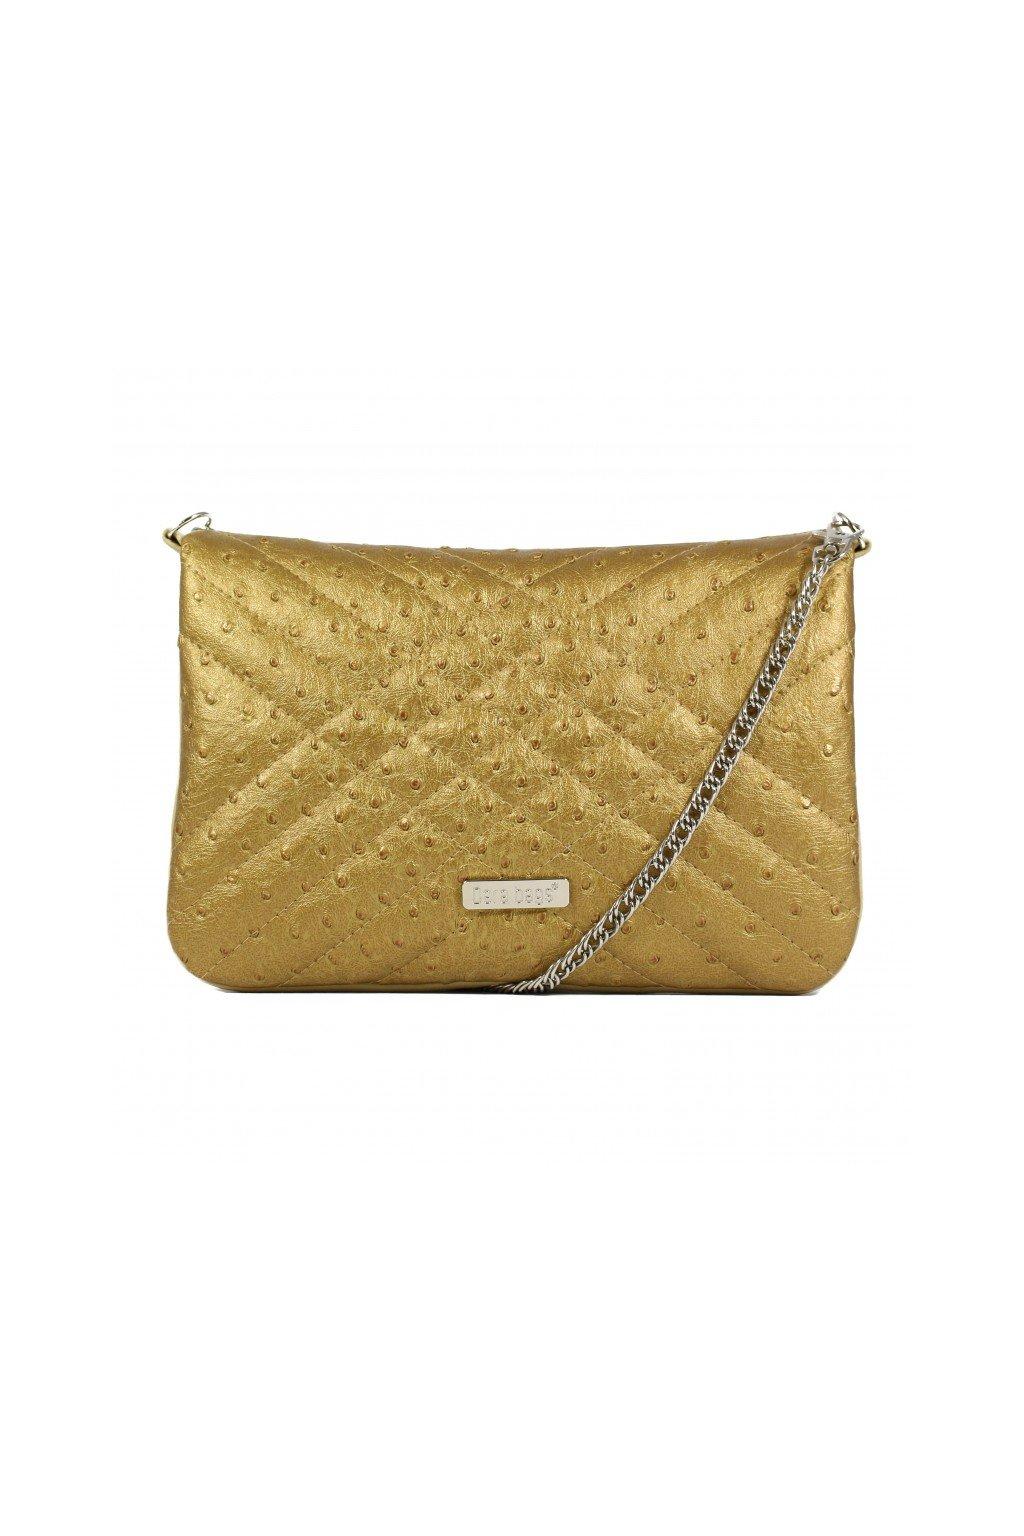 Trpytiva mala kabelka Cocktail Chick Dara bags zlata 1